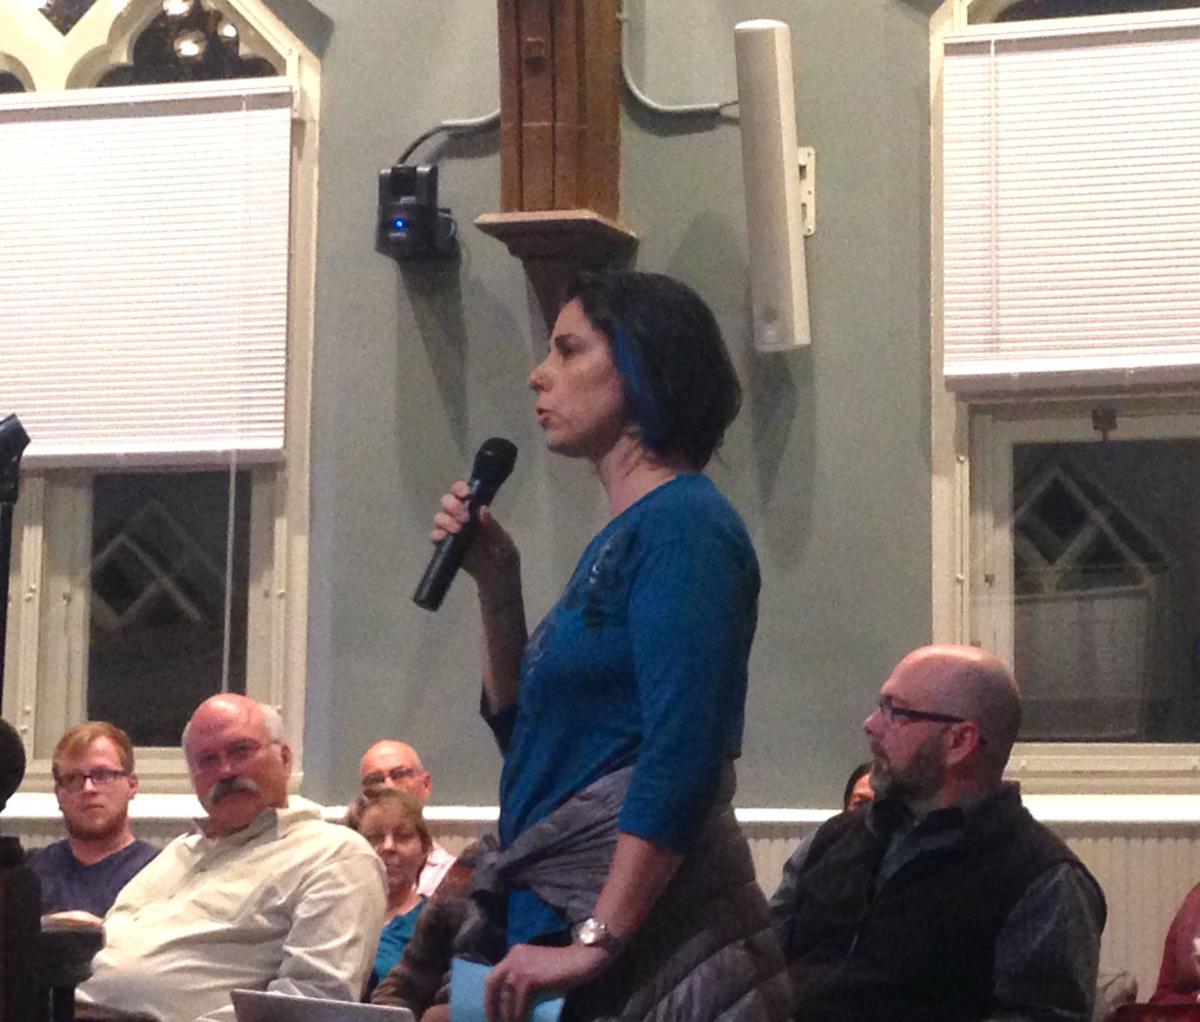 New york tompkins county ithaca 14850 - Tompkins County Passes Pay Raise For Legislators